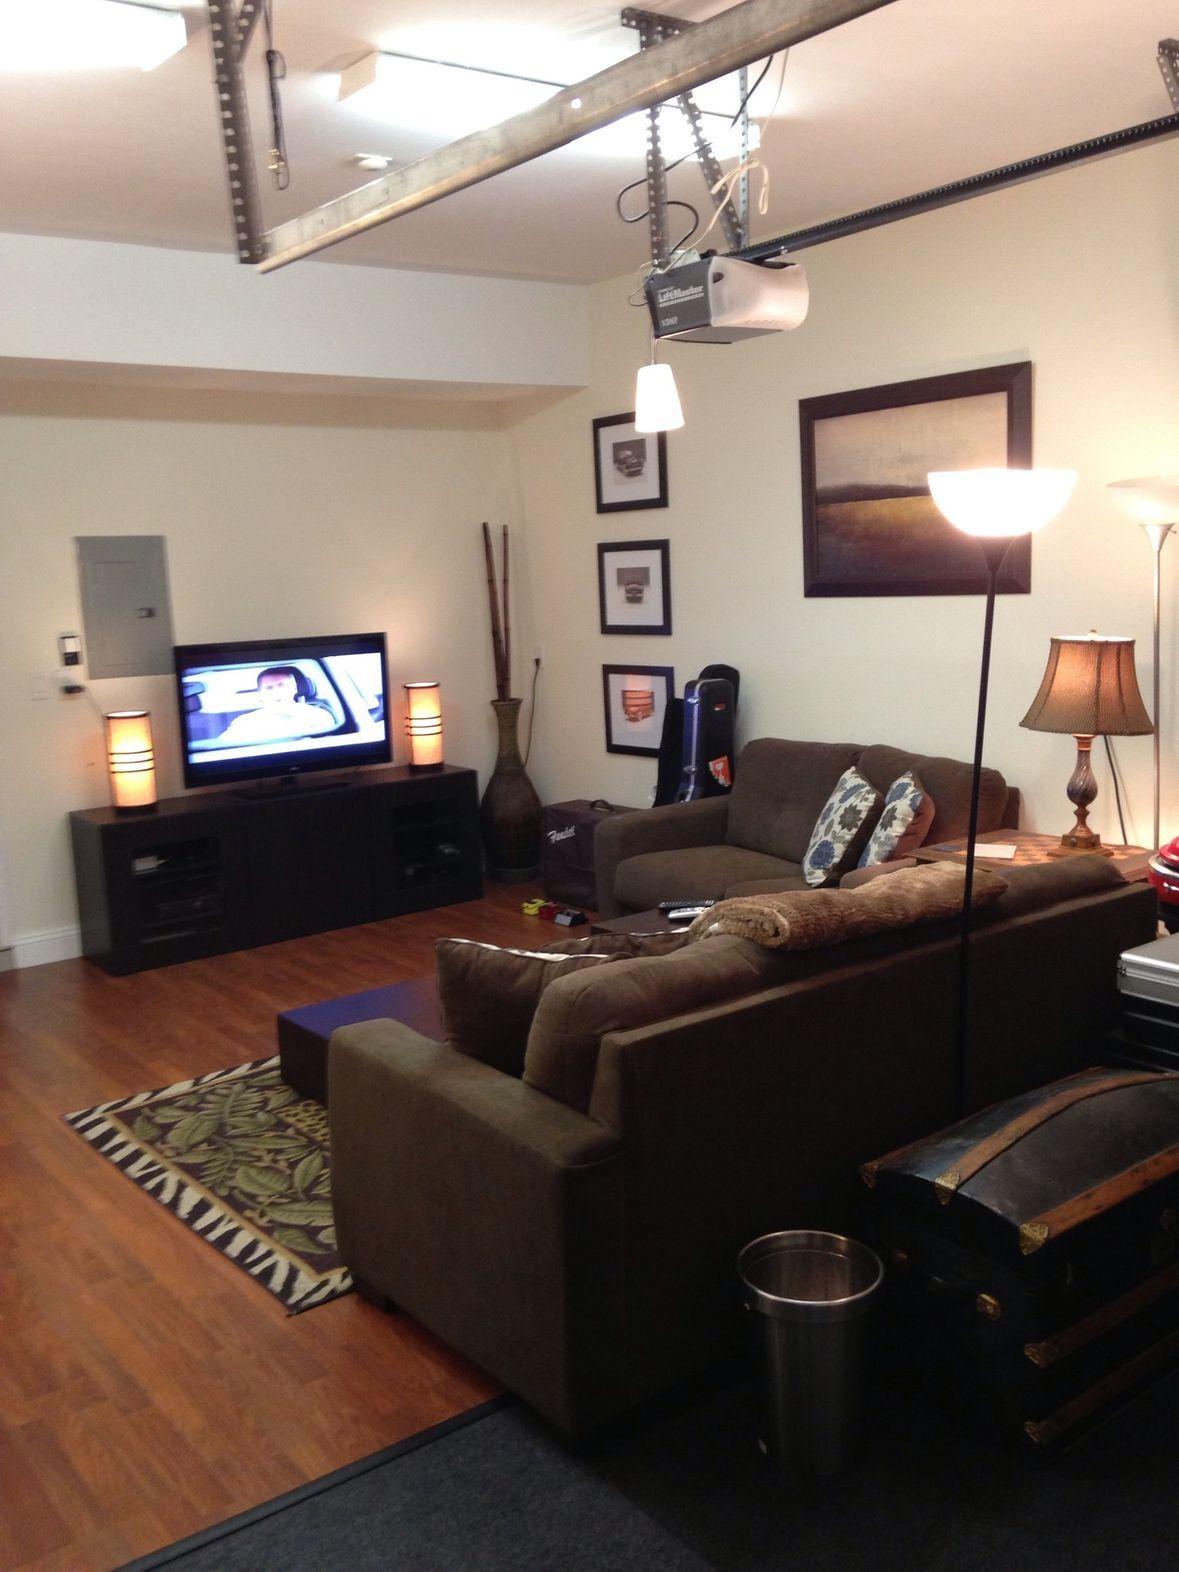 Transform A Garage Into A Living Space On A Budget In 2021 Garage To Living Space Convert Garage To Bedroom Garage Decor